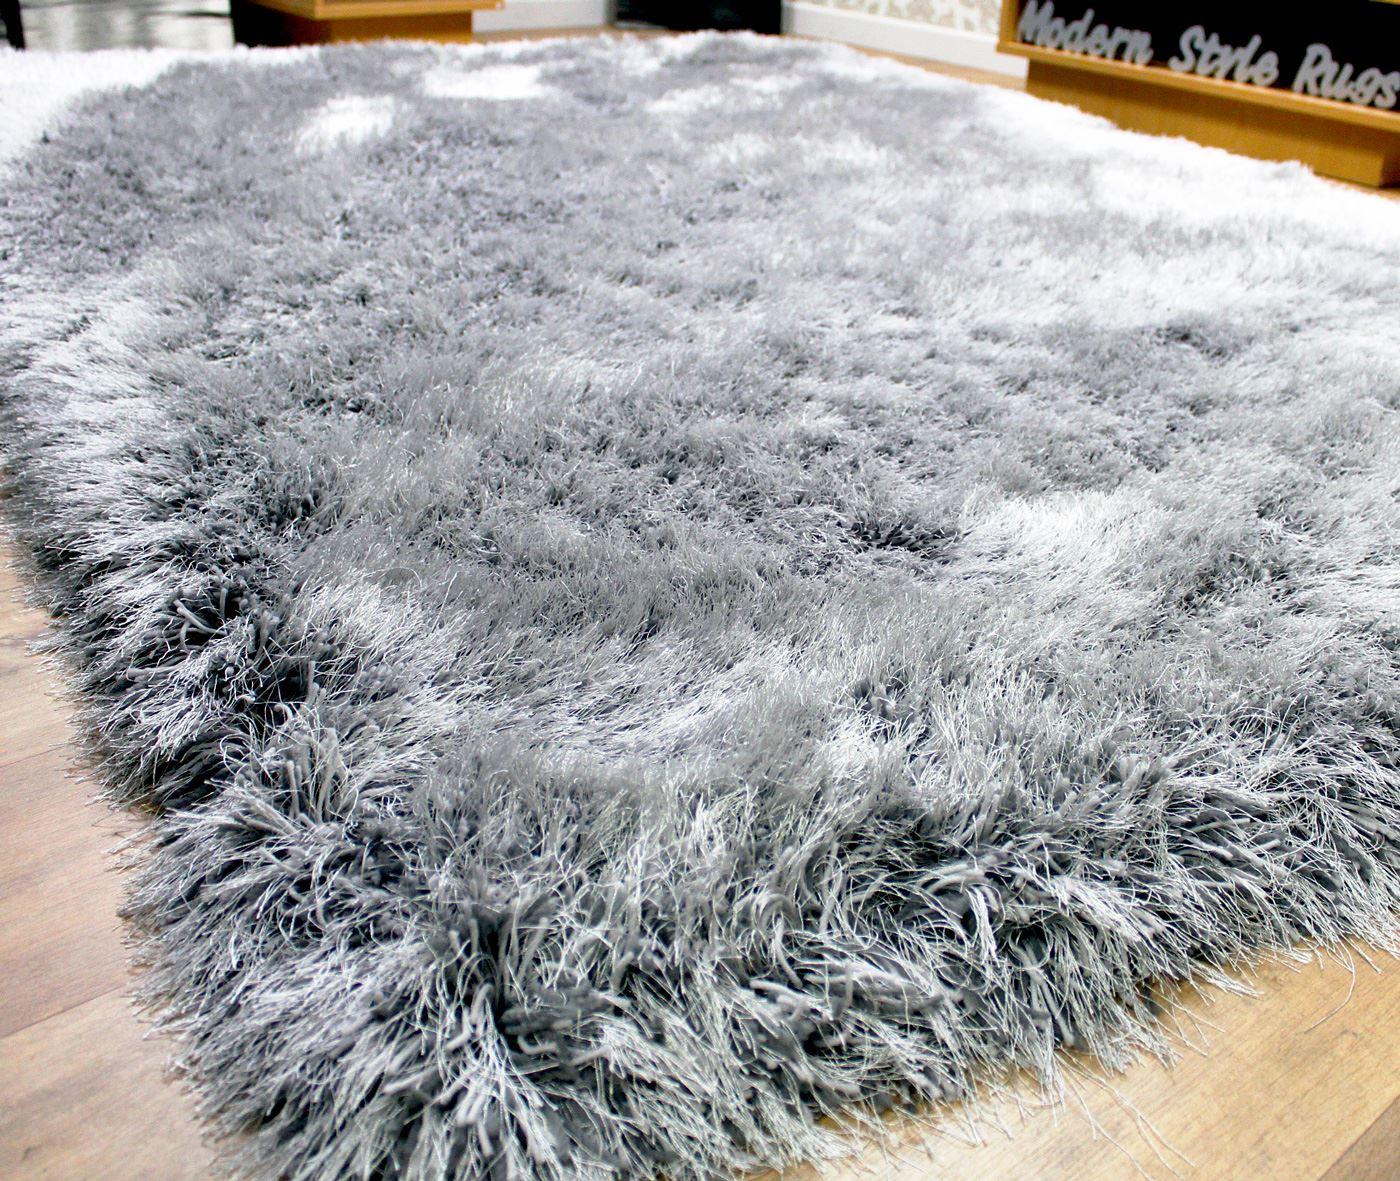 Velvet Soft Rugs In Natural Beige: RRP £249.99+ 9cm Super Plush Mink Beige & Silver Grey